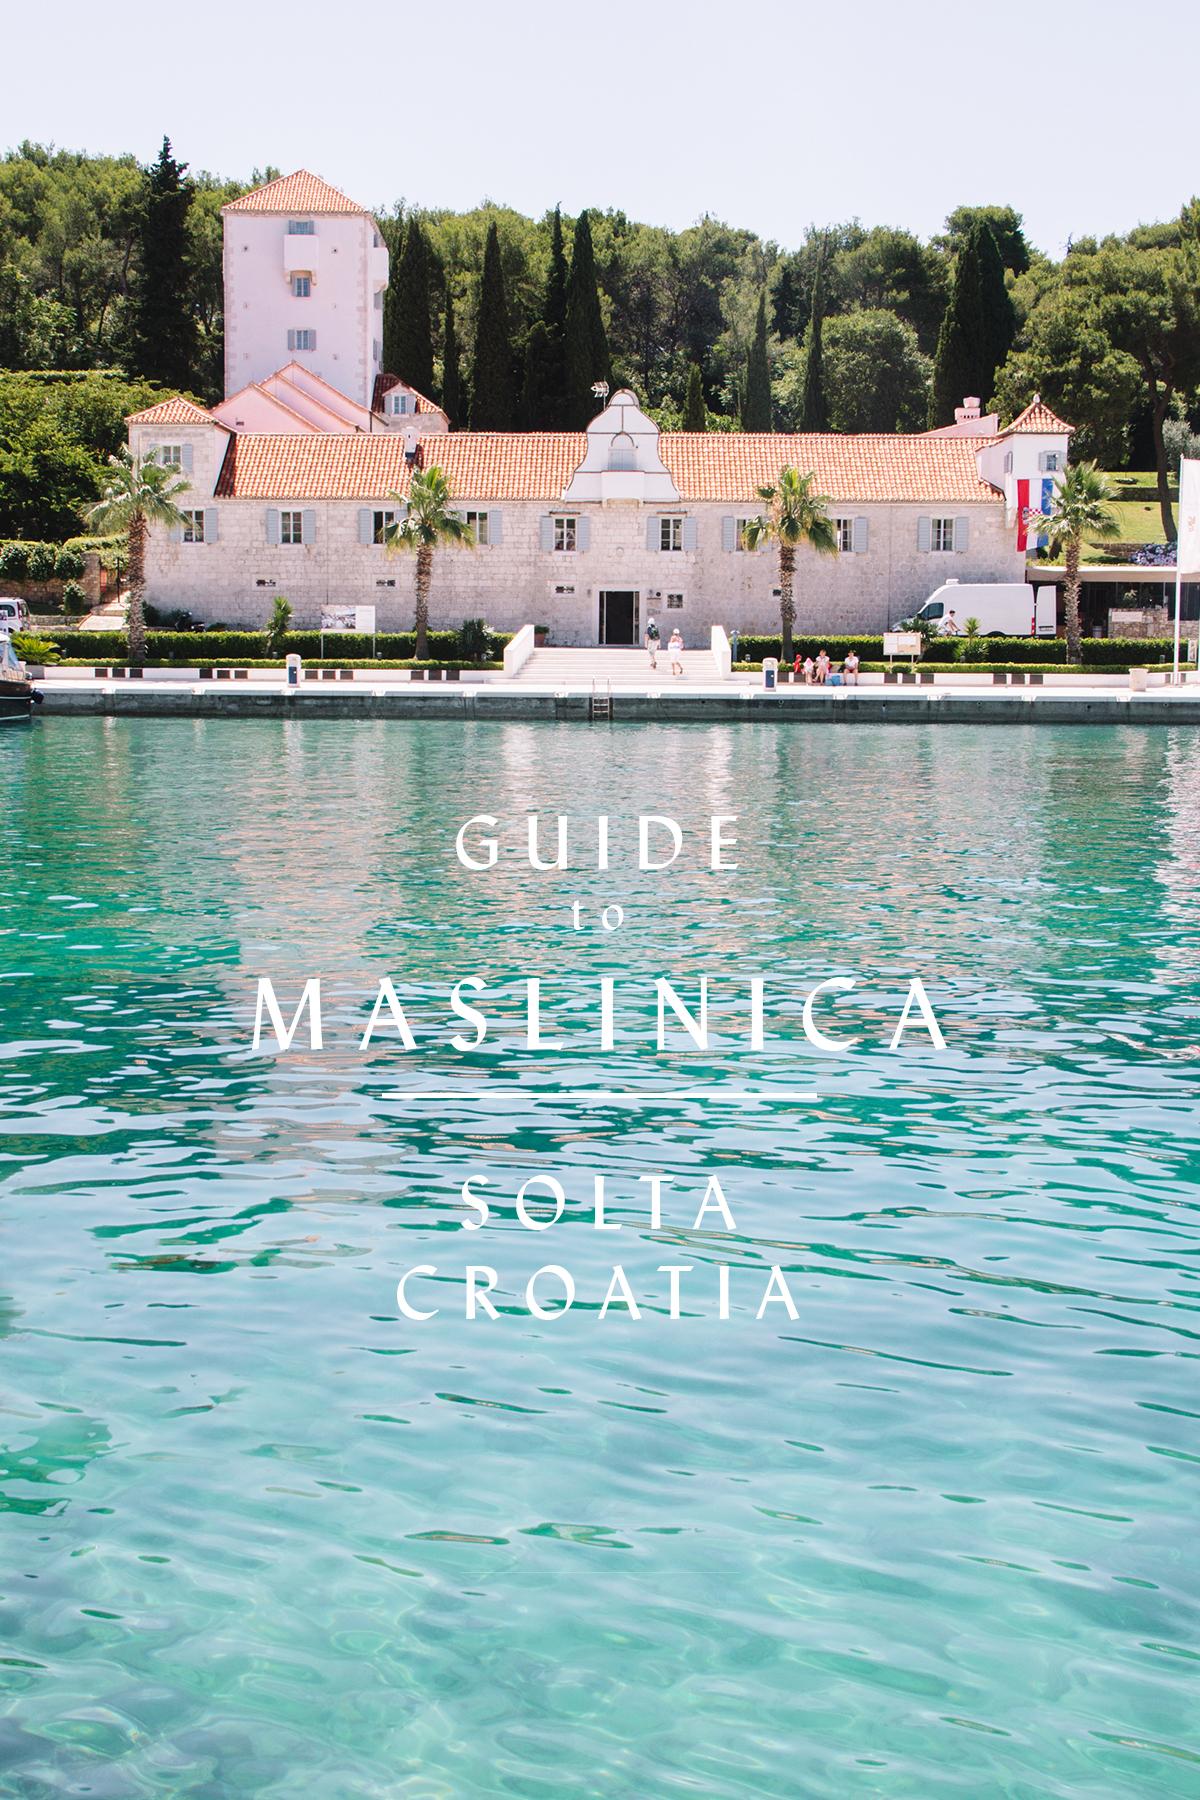 Guide to Maslinica Solta Croatia.jpg